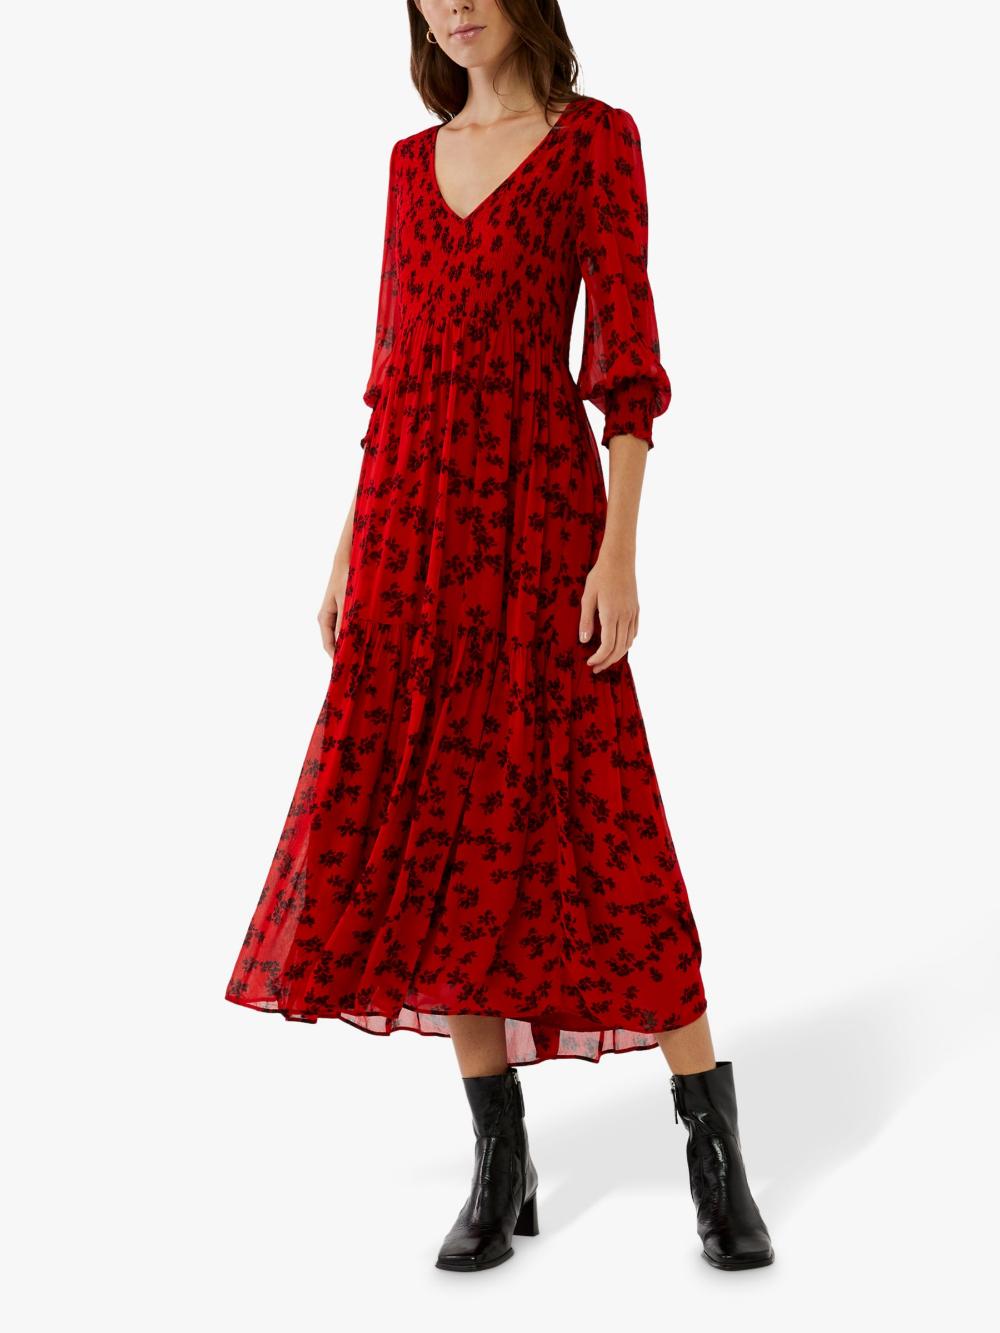 Ghost Jacinta Floral Midi Dress Red Floral Midi Dress Three Quarter Sleeve Dresses Red Midi Dress [ 1333 x 1000 Pixel ]